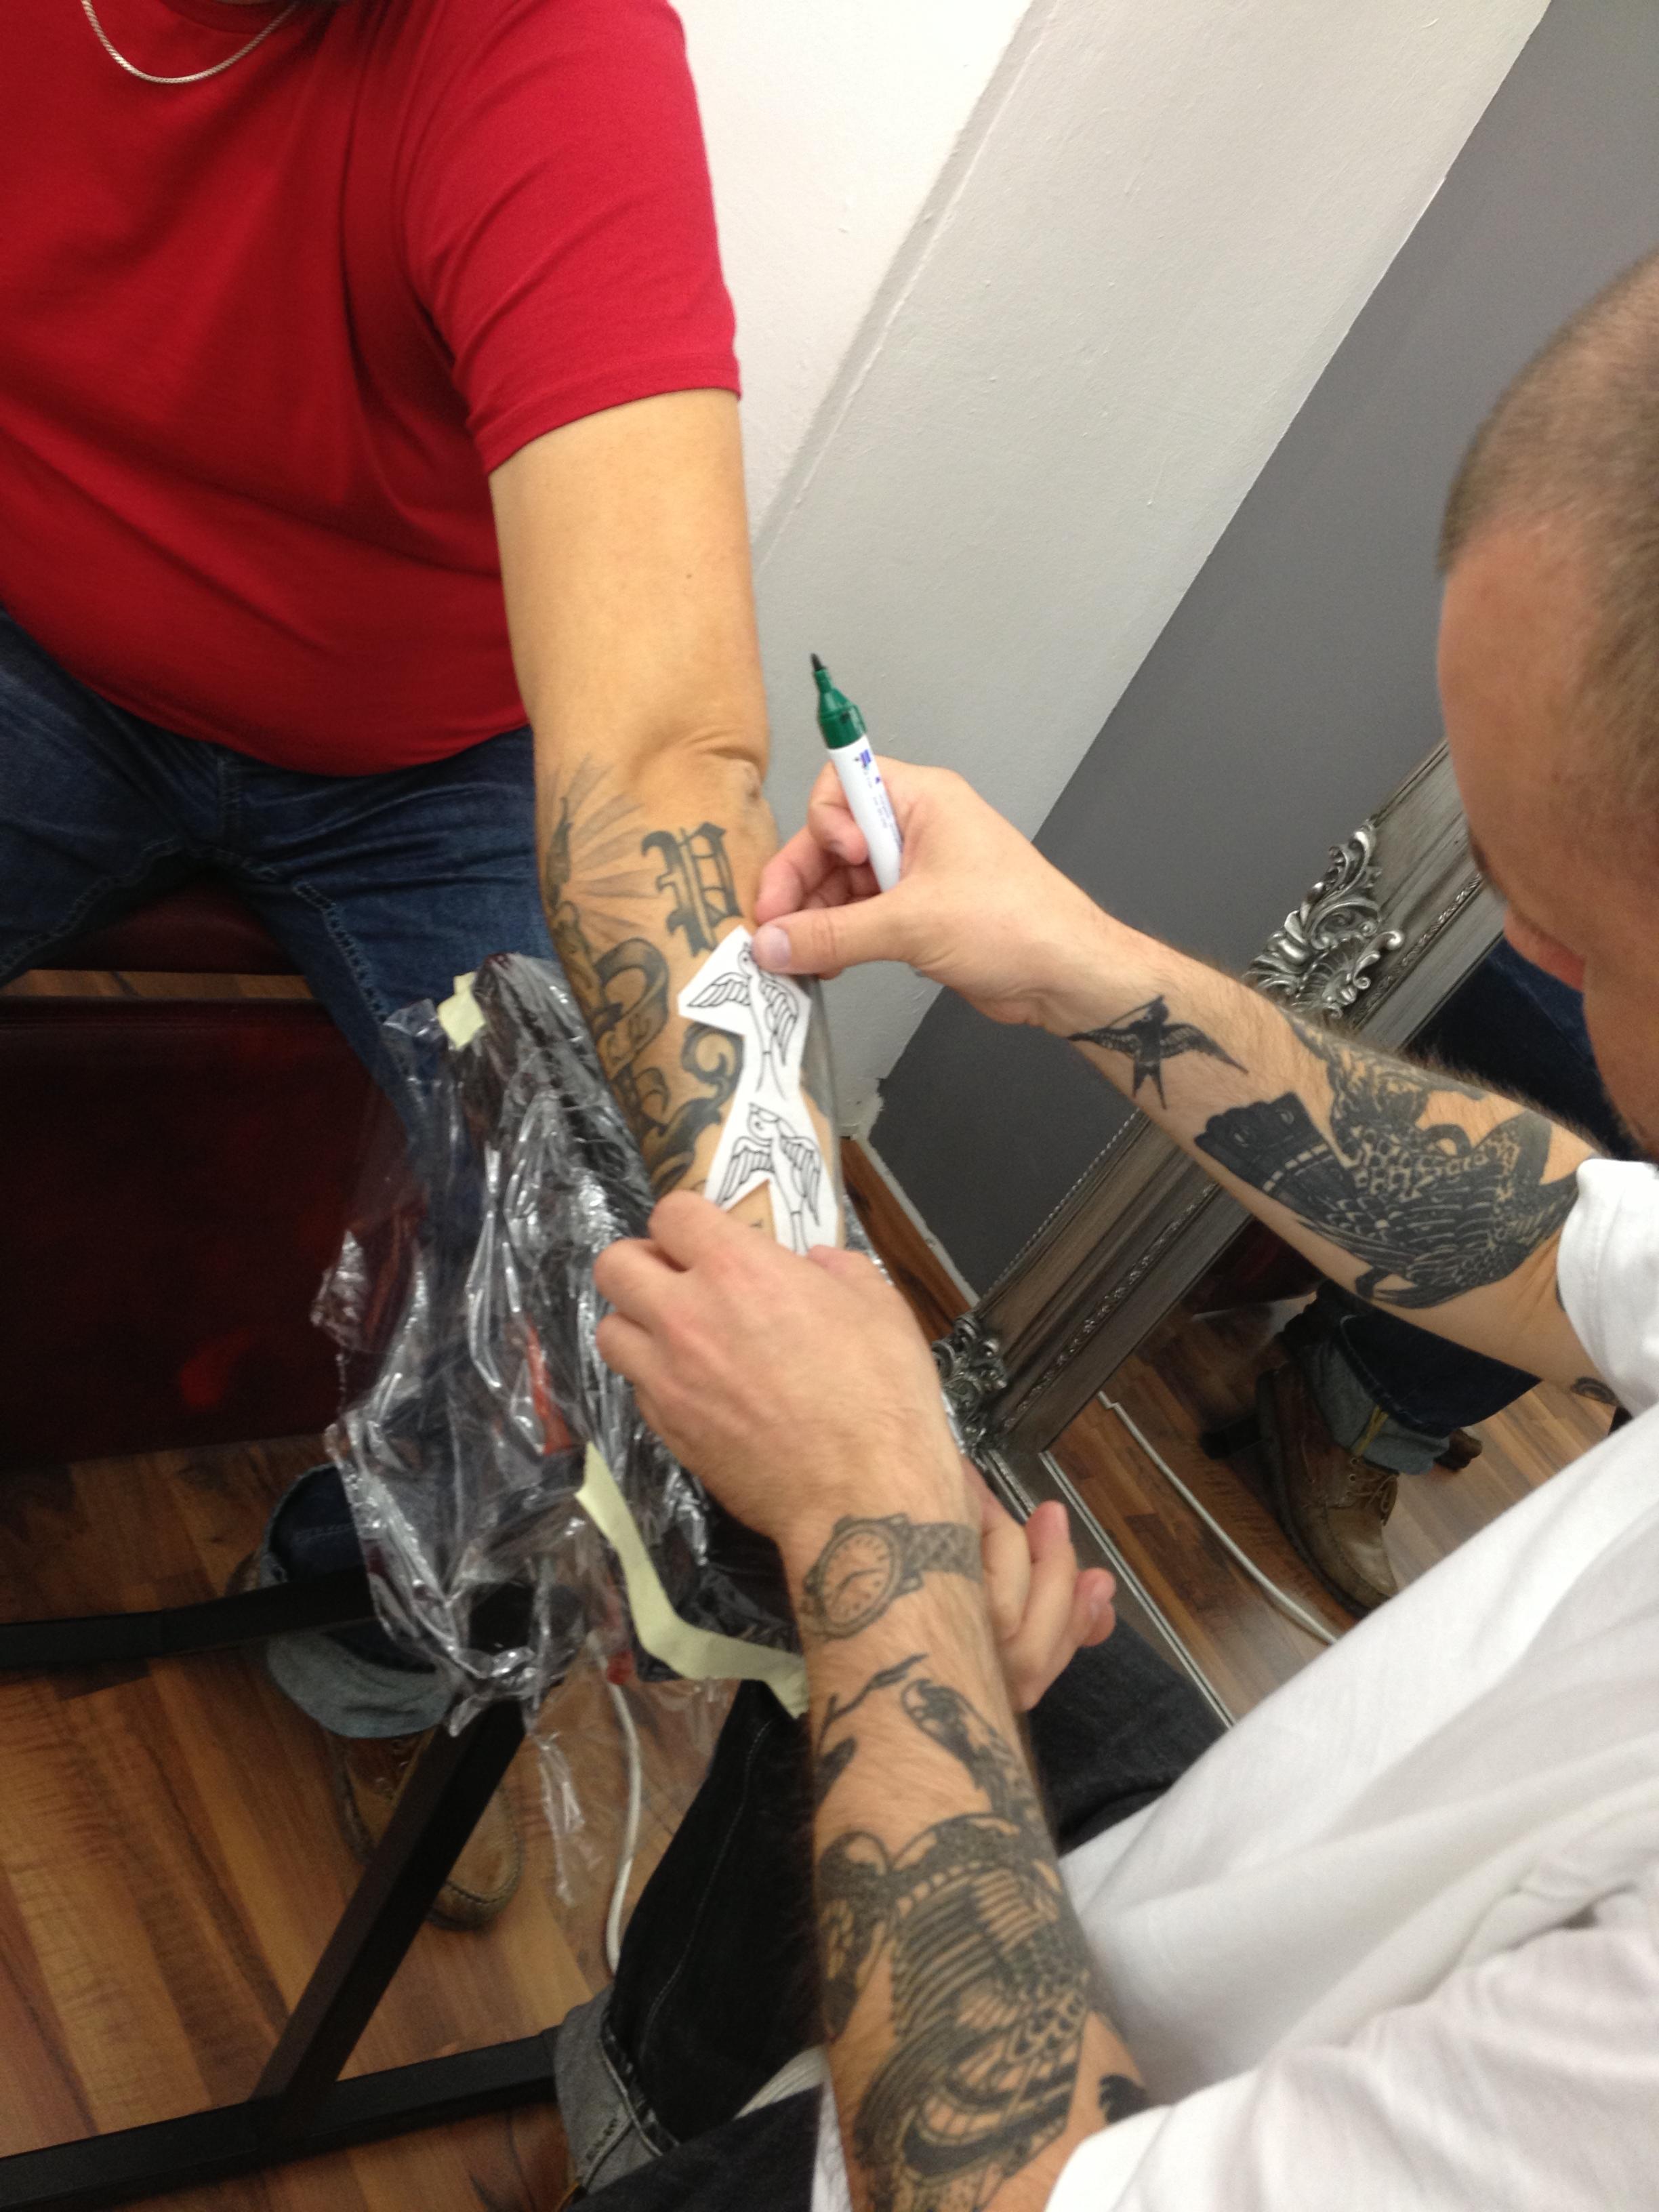 Il tetovader da Berna Jan tetovescha ad in client duas randulinas. Ed er il tetovader sez porta ina randulina sut la pel. Tgi vesa nua?